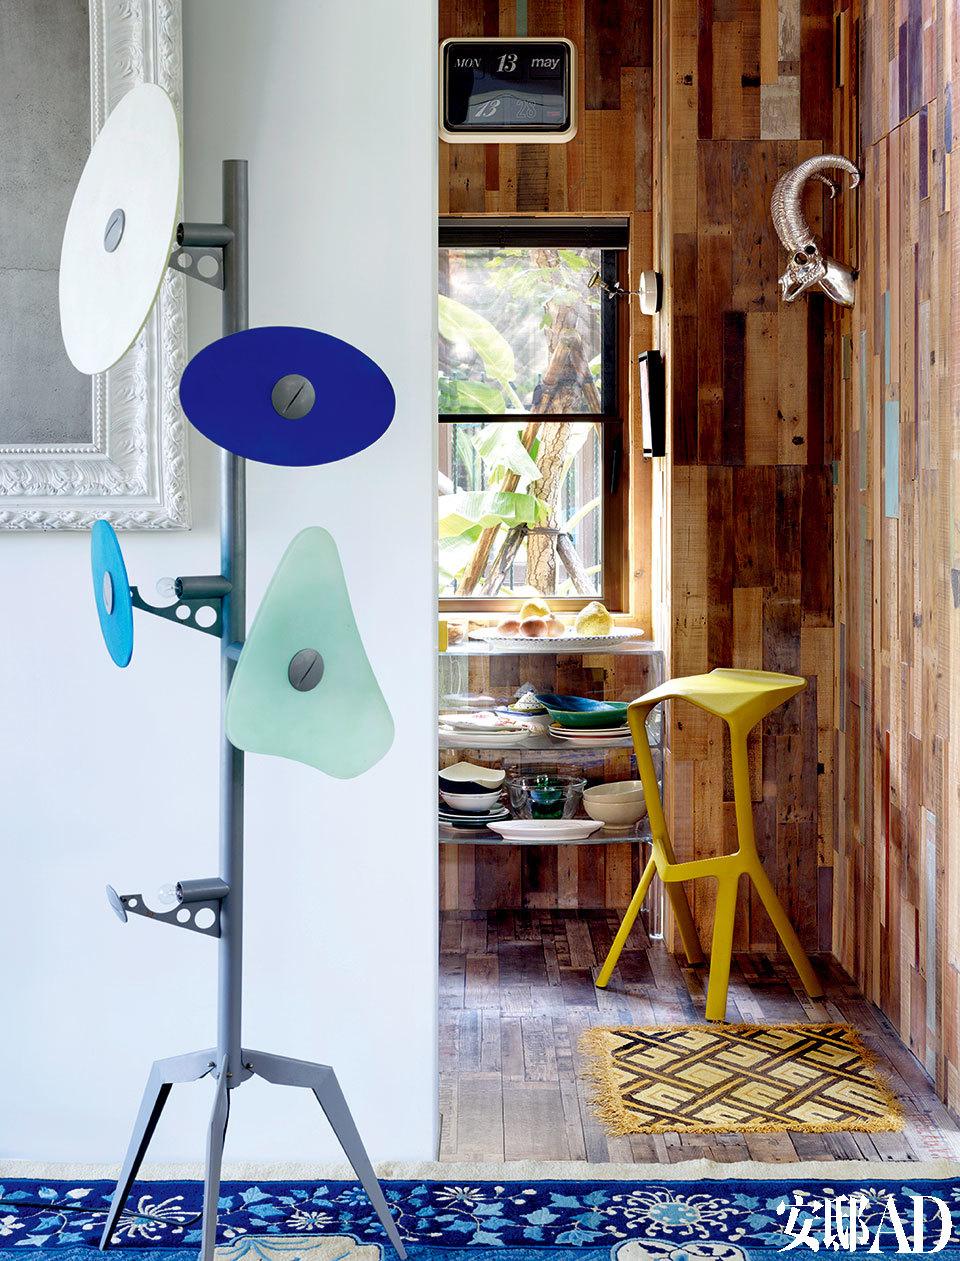 """Orbital Verra""蓝色立灯为上世纪70年代波普艺术后的灯具设计,Foscarini出品。铺上回收木板拼贴墙面,挂着2008年于曼谷旅行买的羊头装置(爱尔兰制造),草绿色高脚椅为设计师Konstantin Grcic的代表作,上有设计师的亲笔签名,Magis出品。"